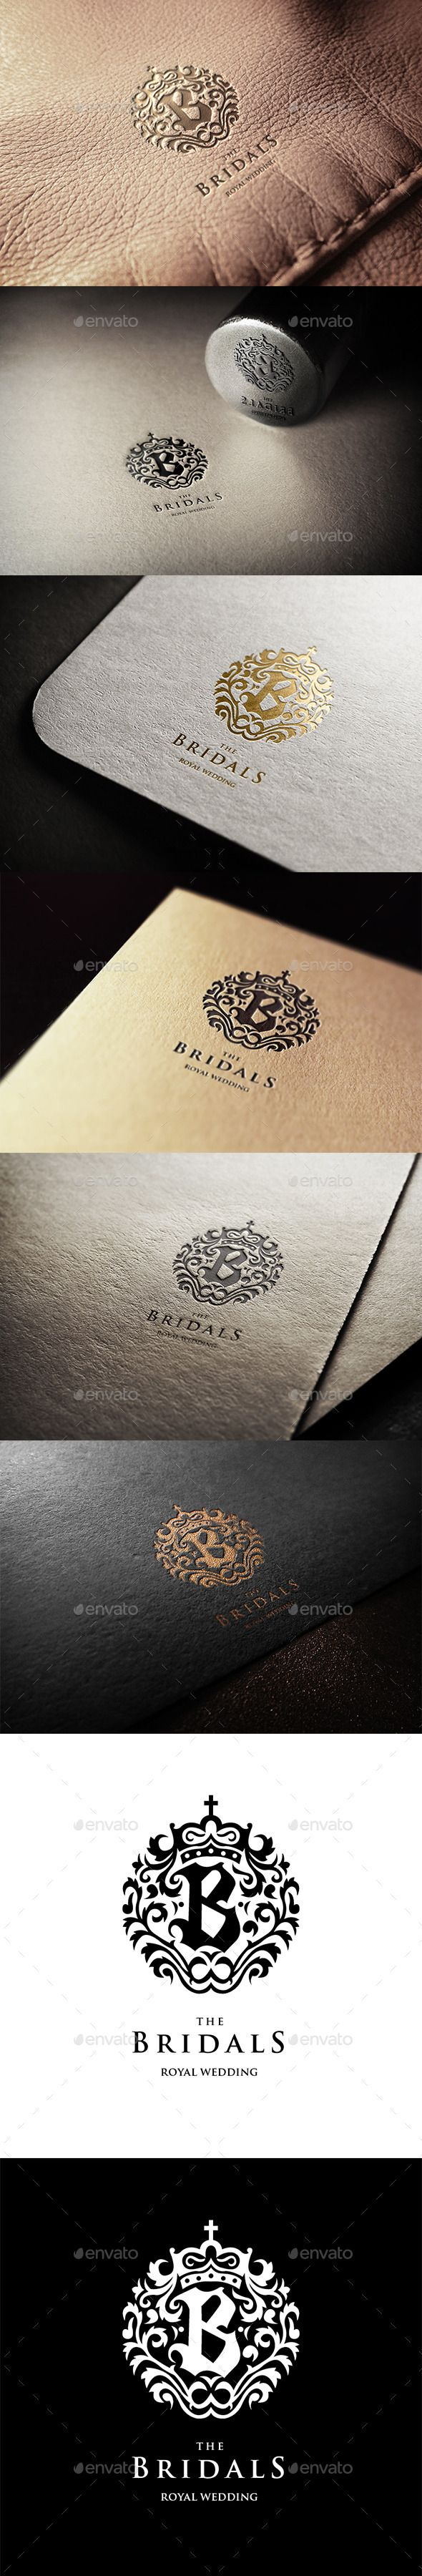 The Bridals Logo Template #design #logotype Download: http://graphicriver.net/item/the-bridals-logo/11272861?ref=ksioks